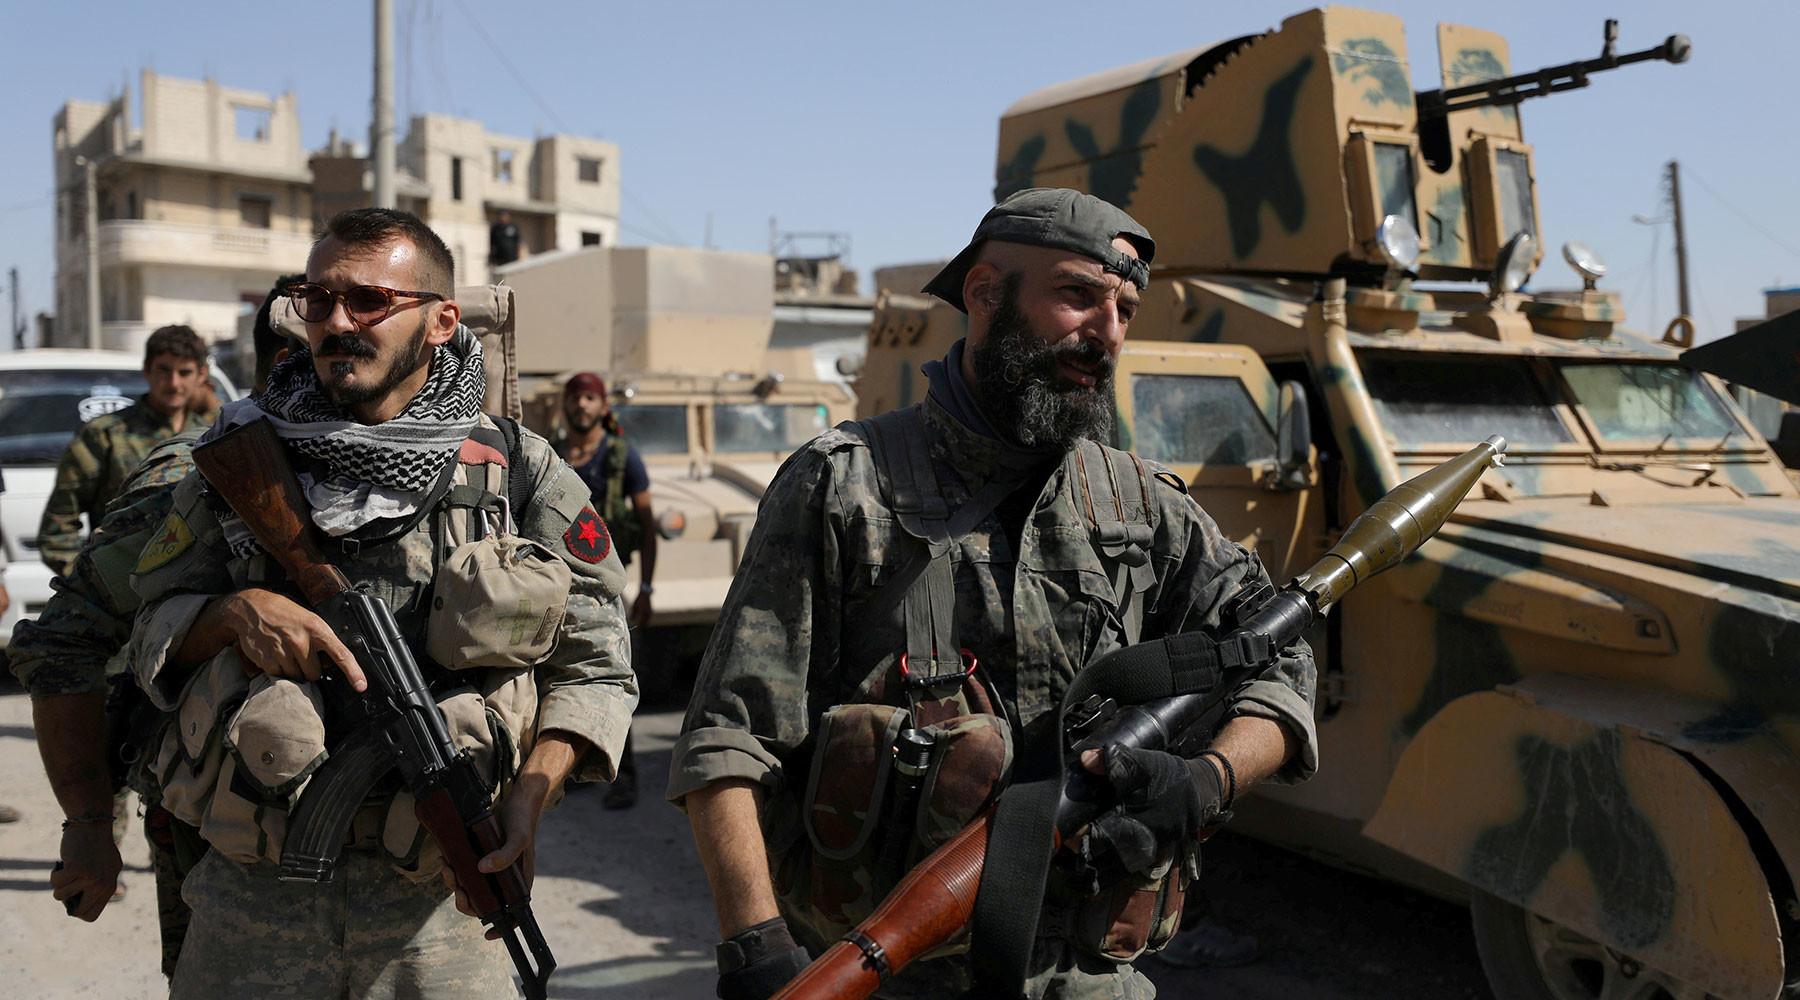 Сирийская армия взяла контроль над Дейр-эз-Зором